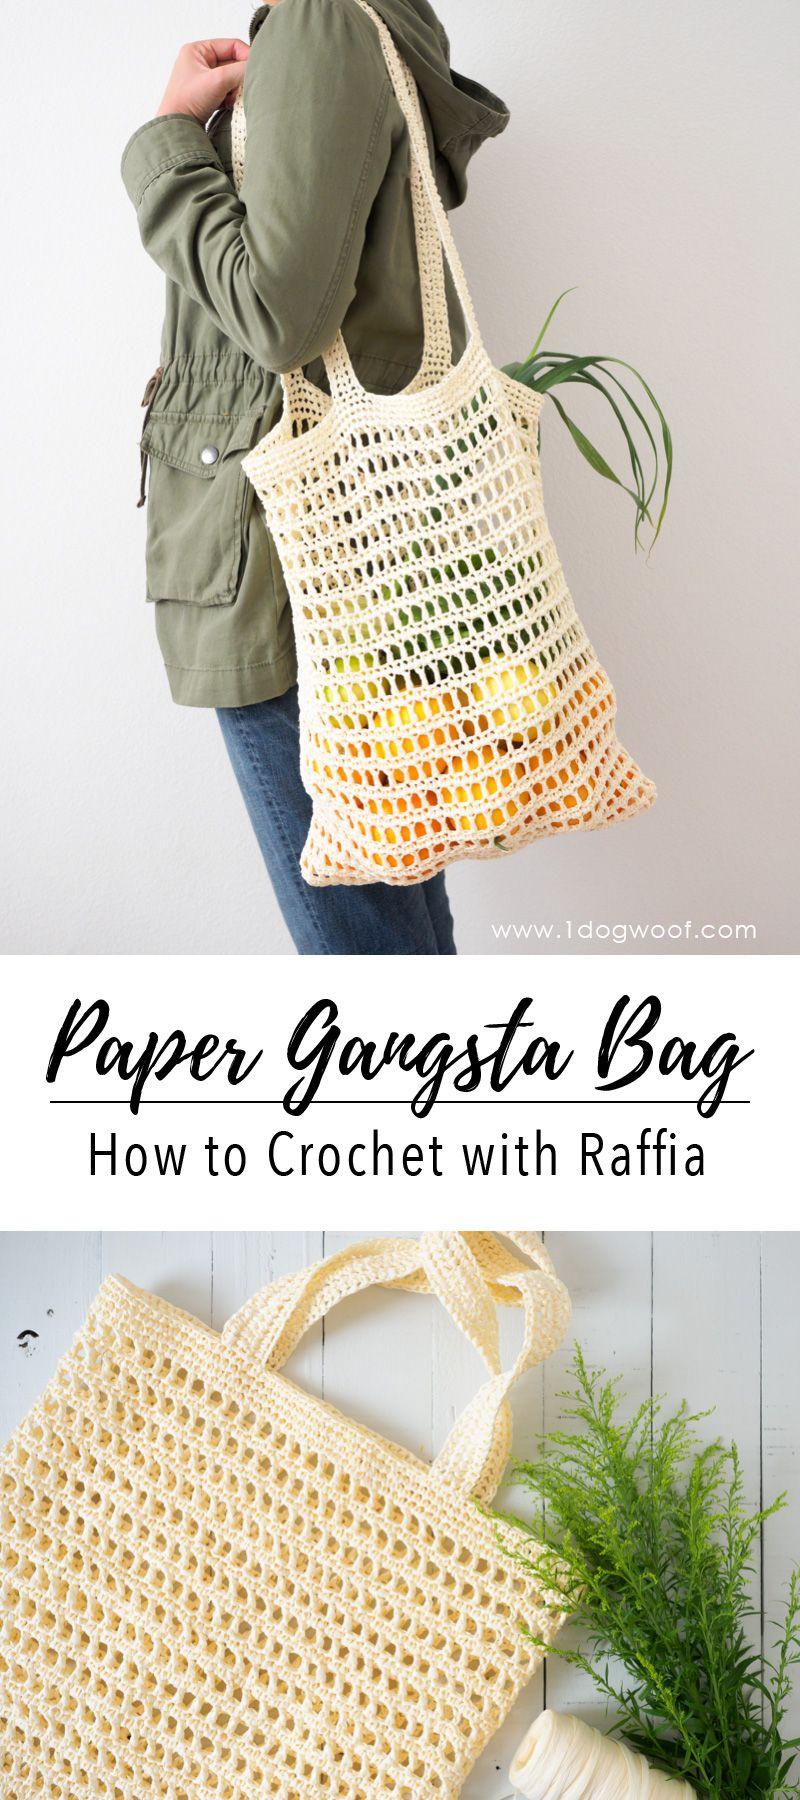 How to Crochet with Raffia | Crochet items | Pinterest | Bolsos